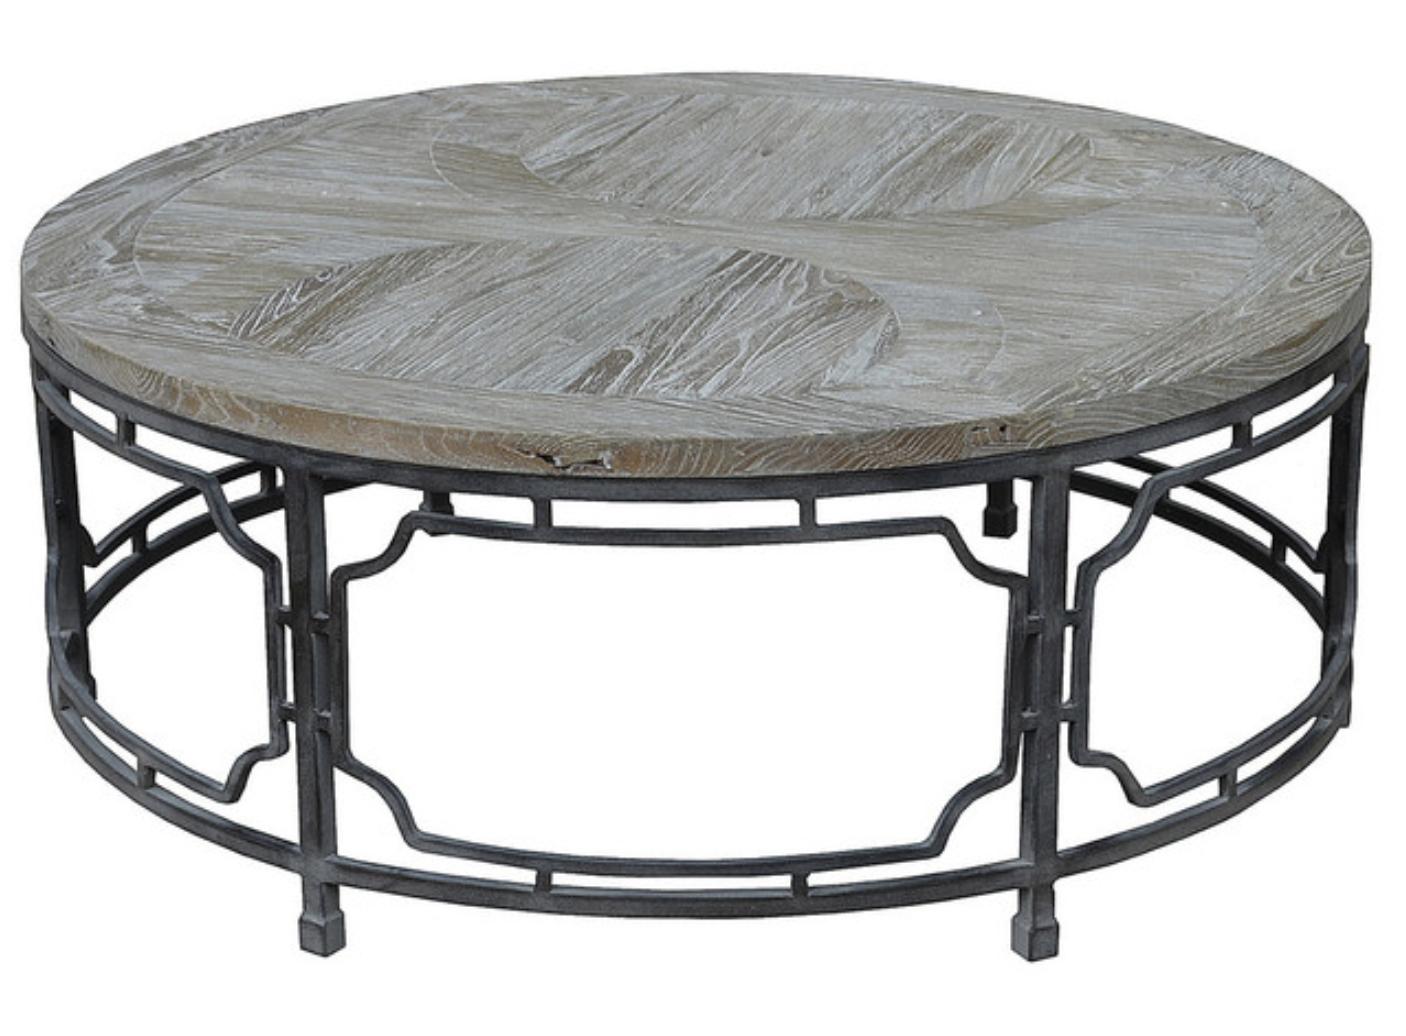 norwalk-cocktail-table